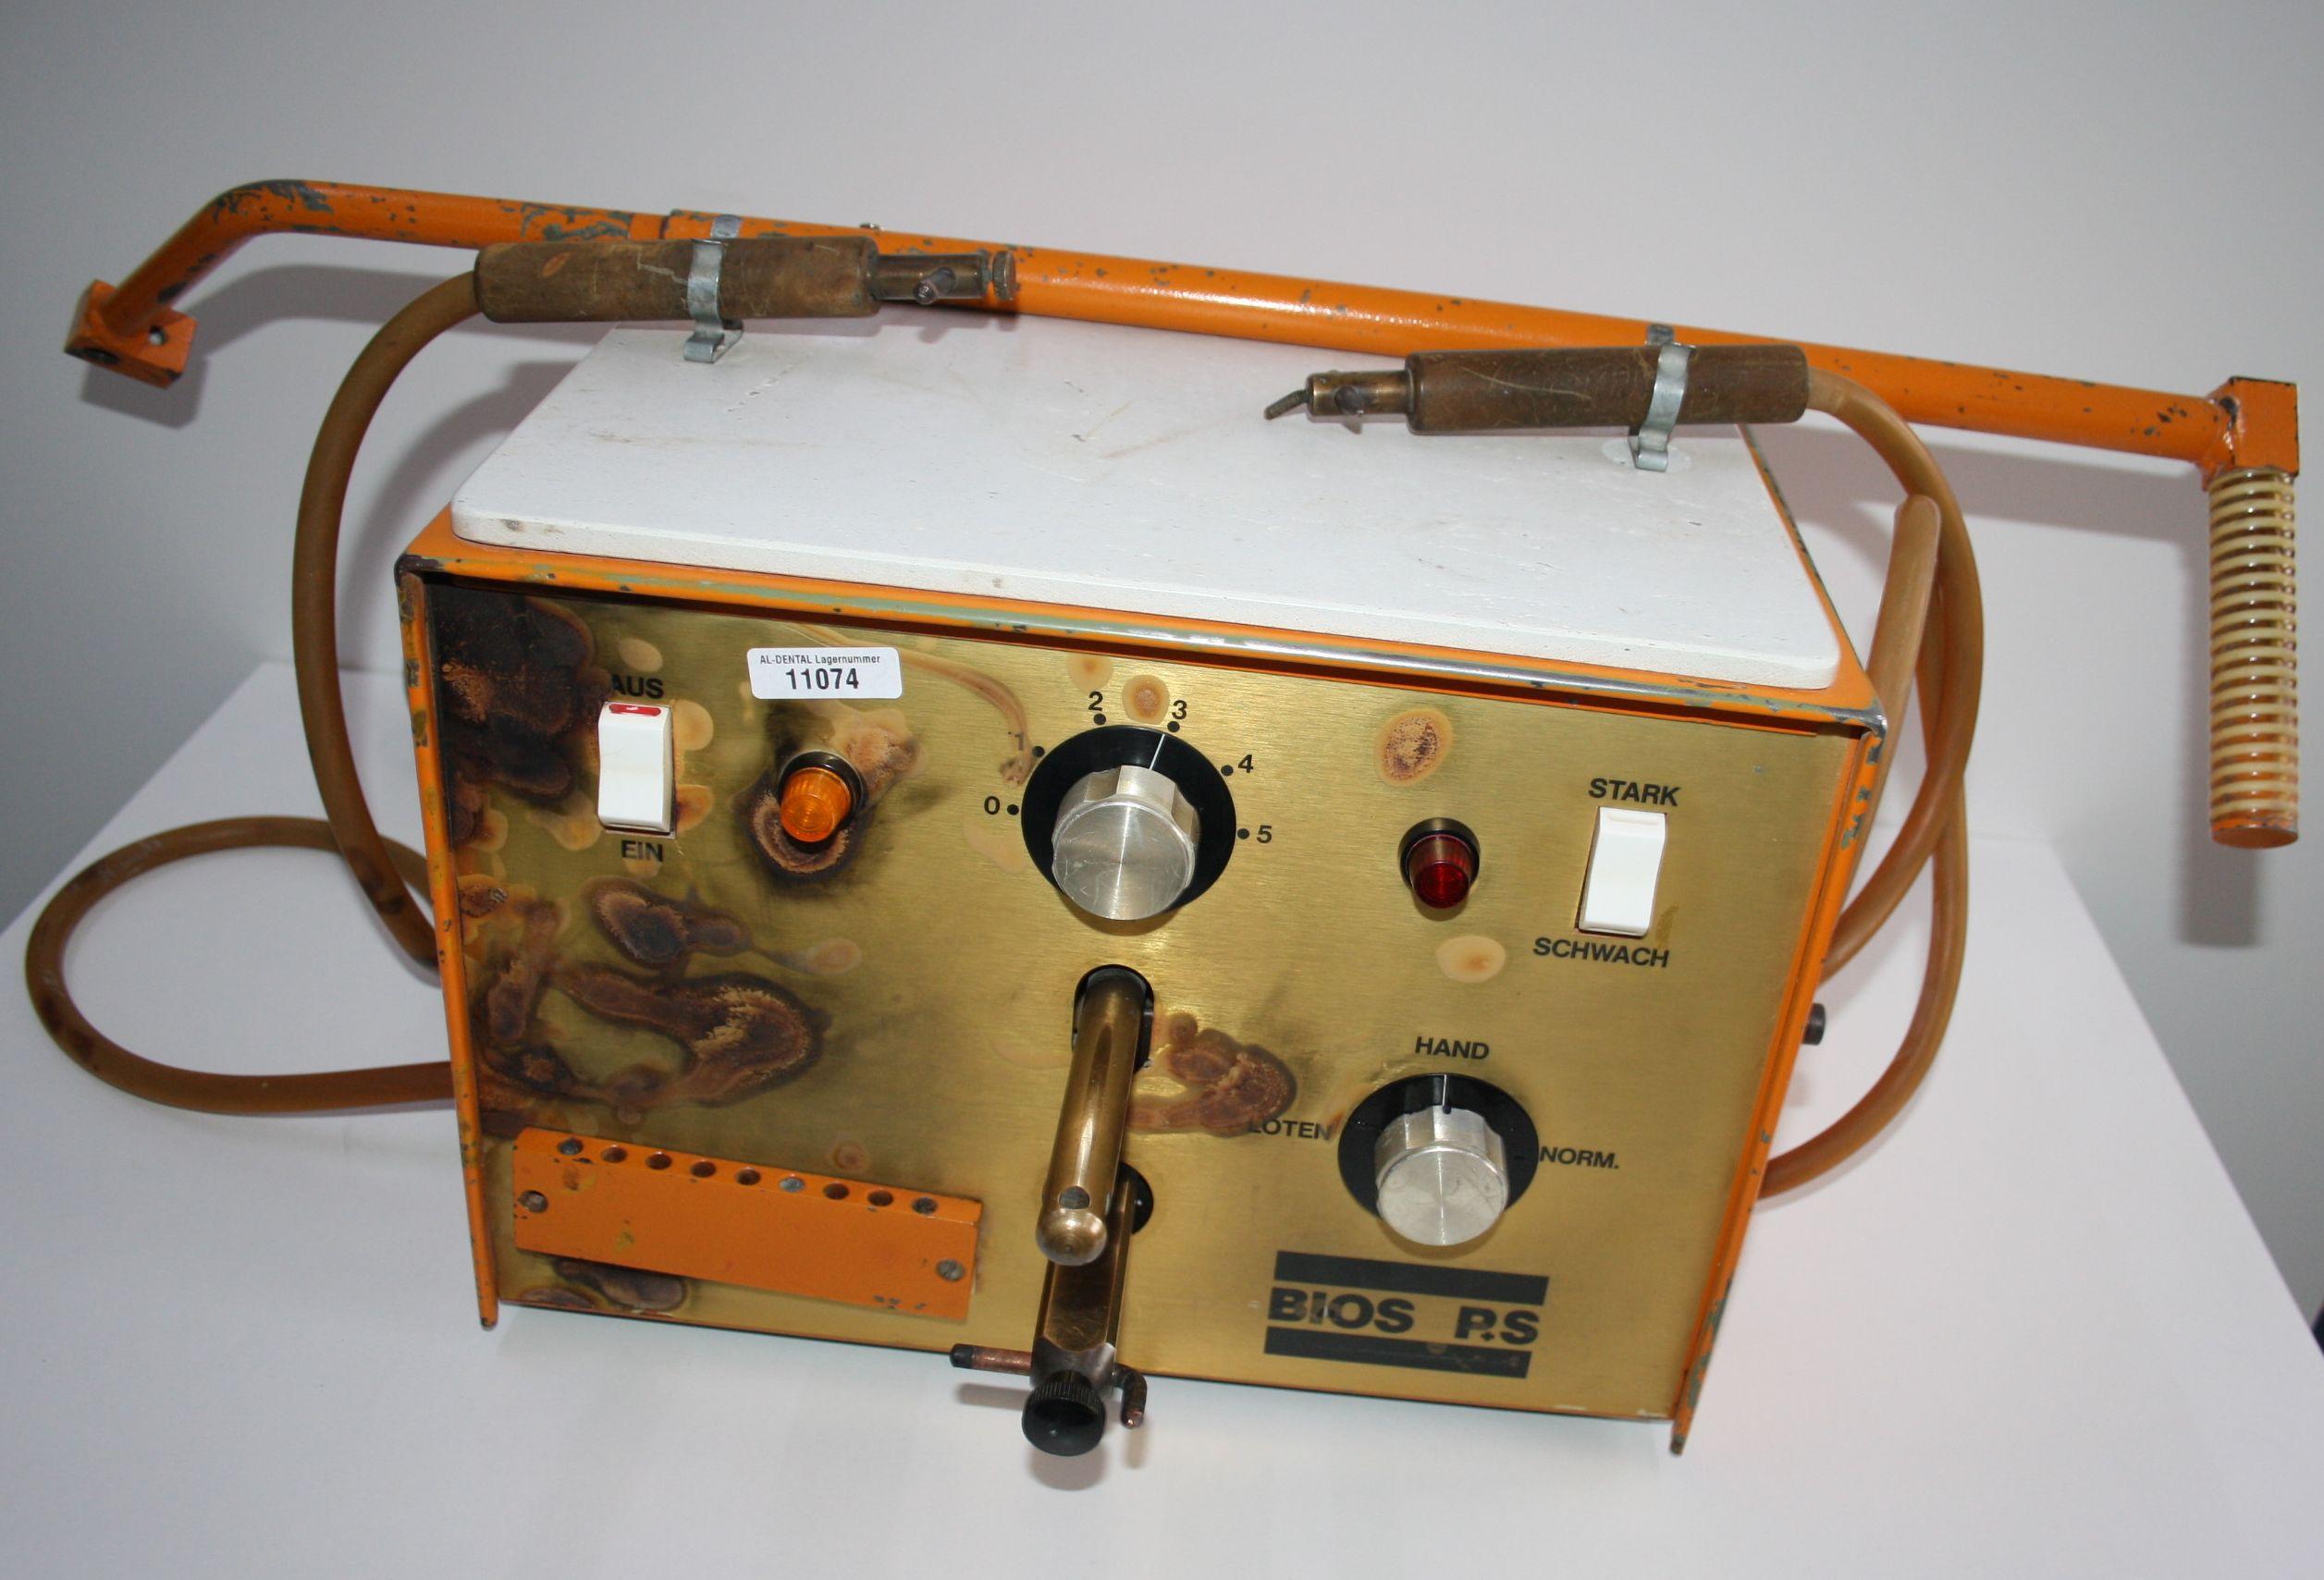 BIOS RS Punktschweißgerät / Lötgerät # 11074